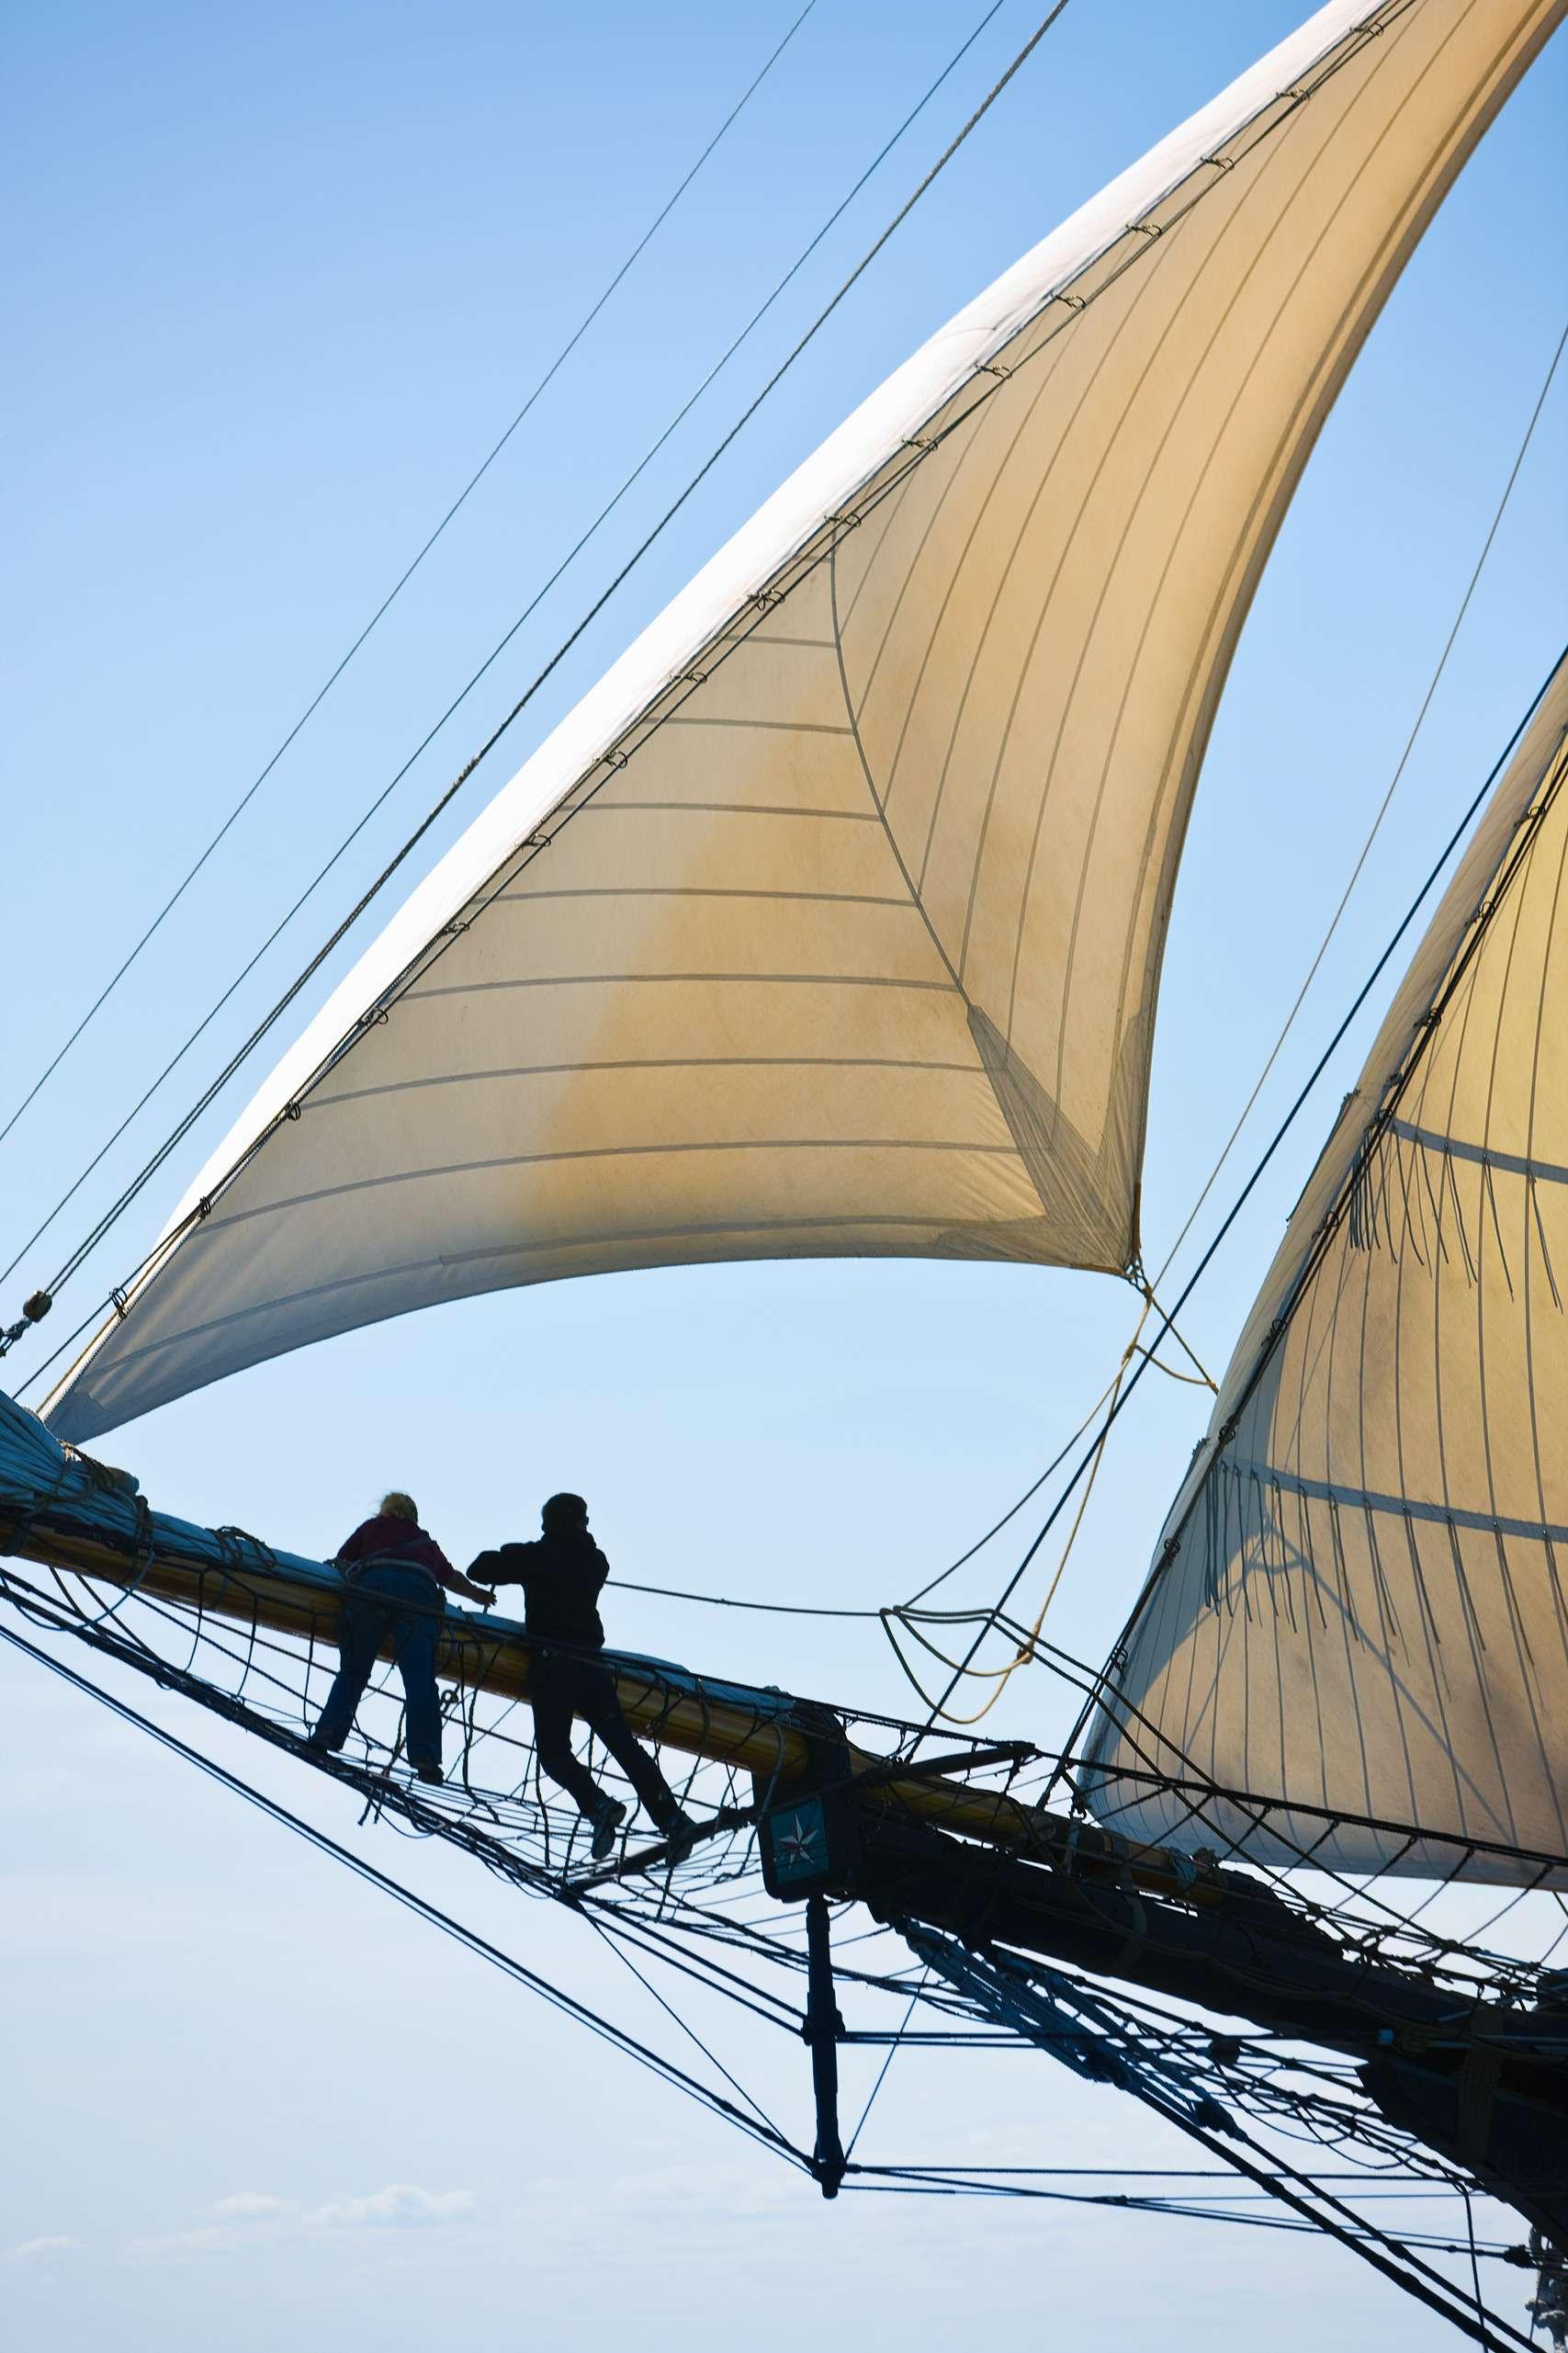 PORTFOLIO - Sailing - Windjammers #8   PCG455